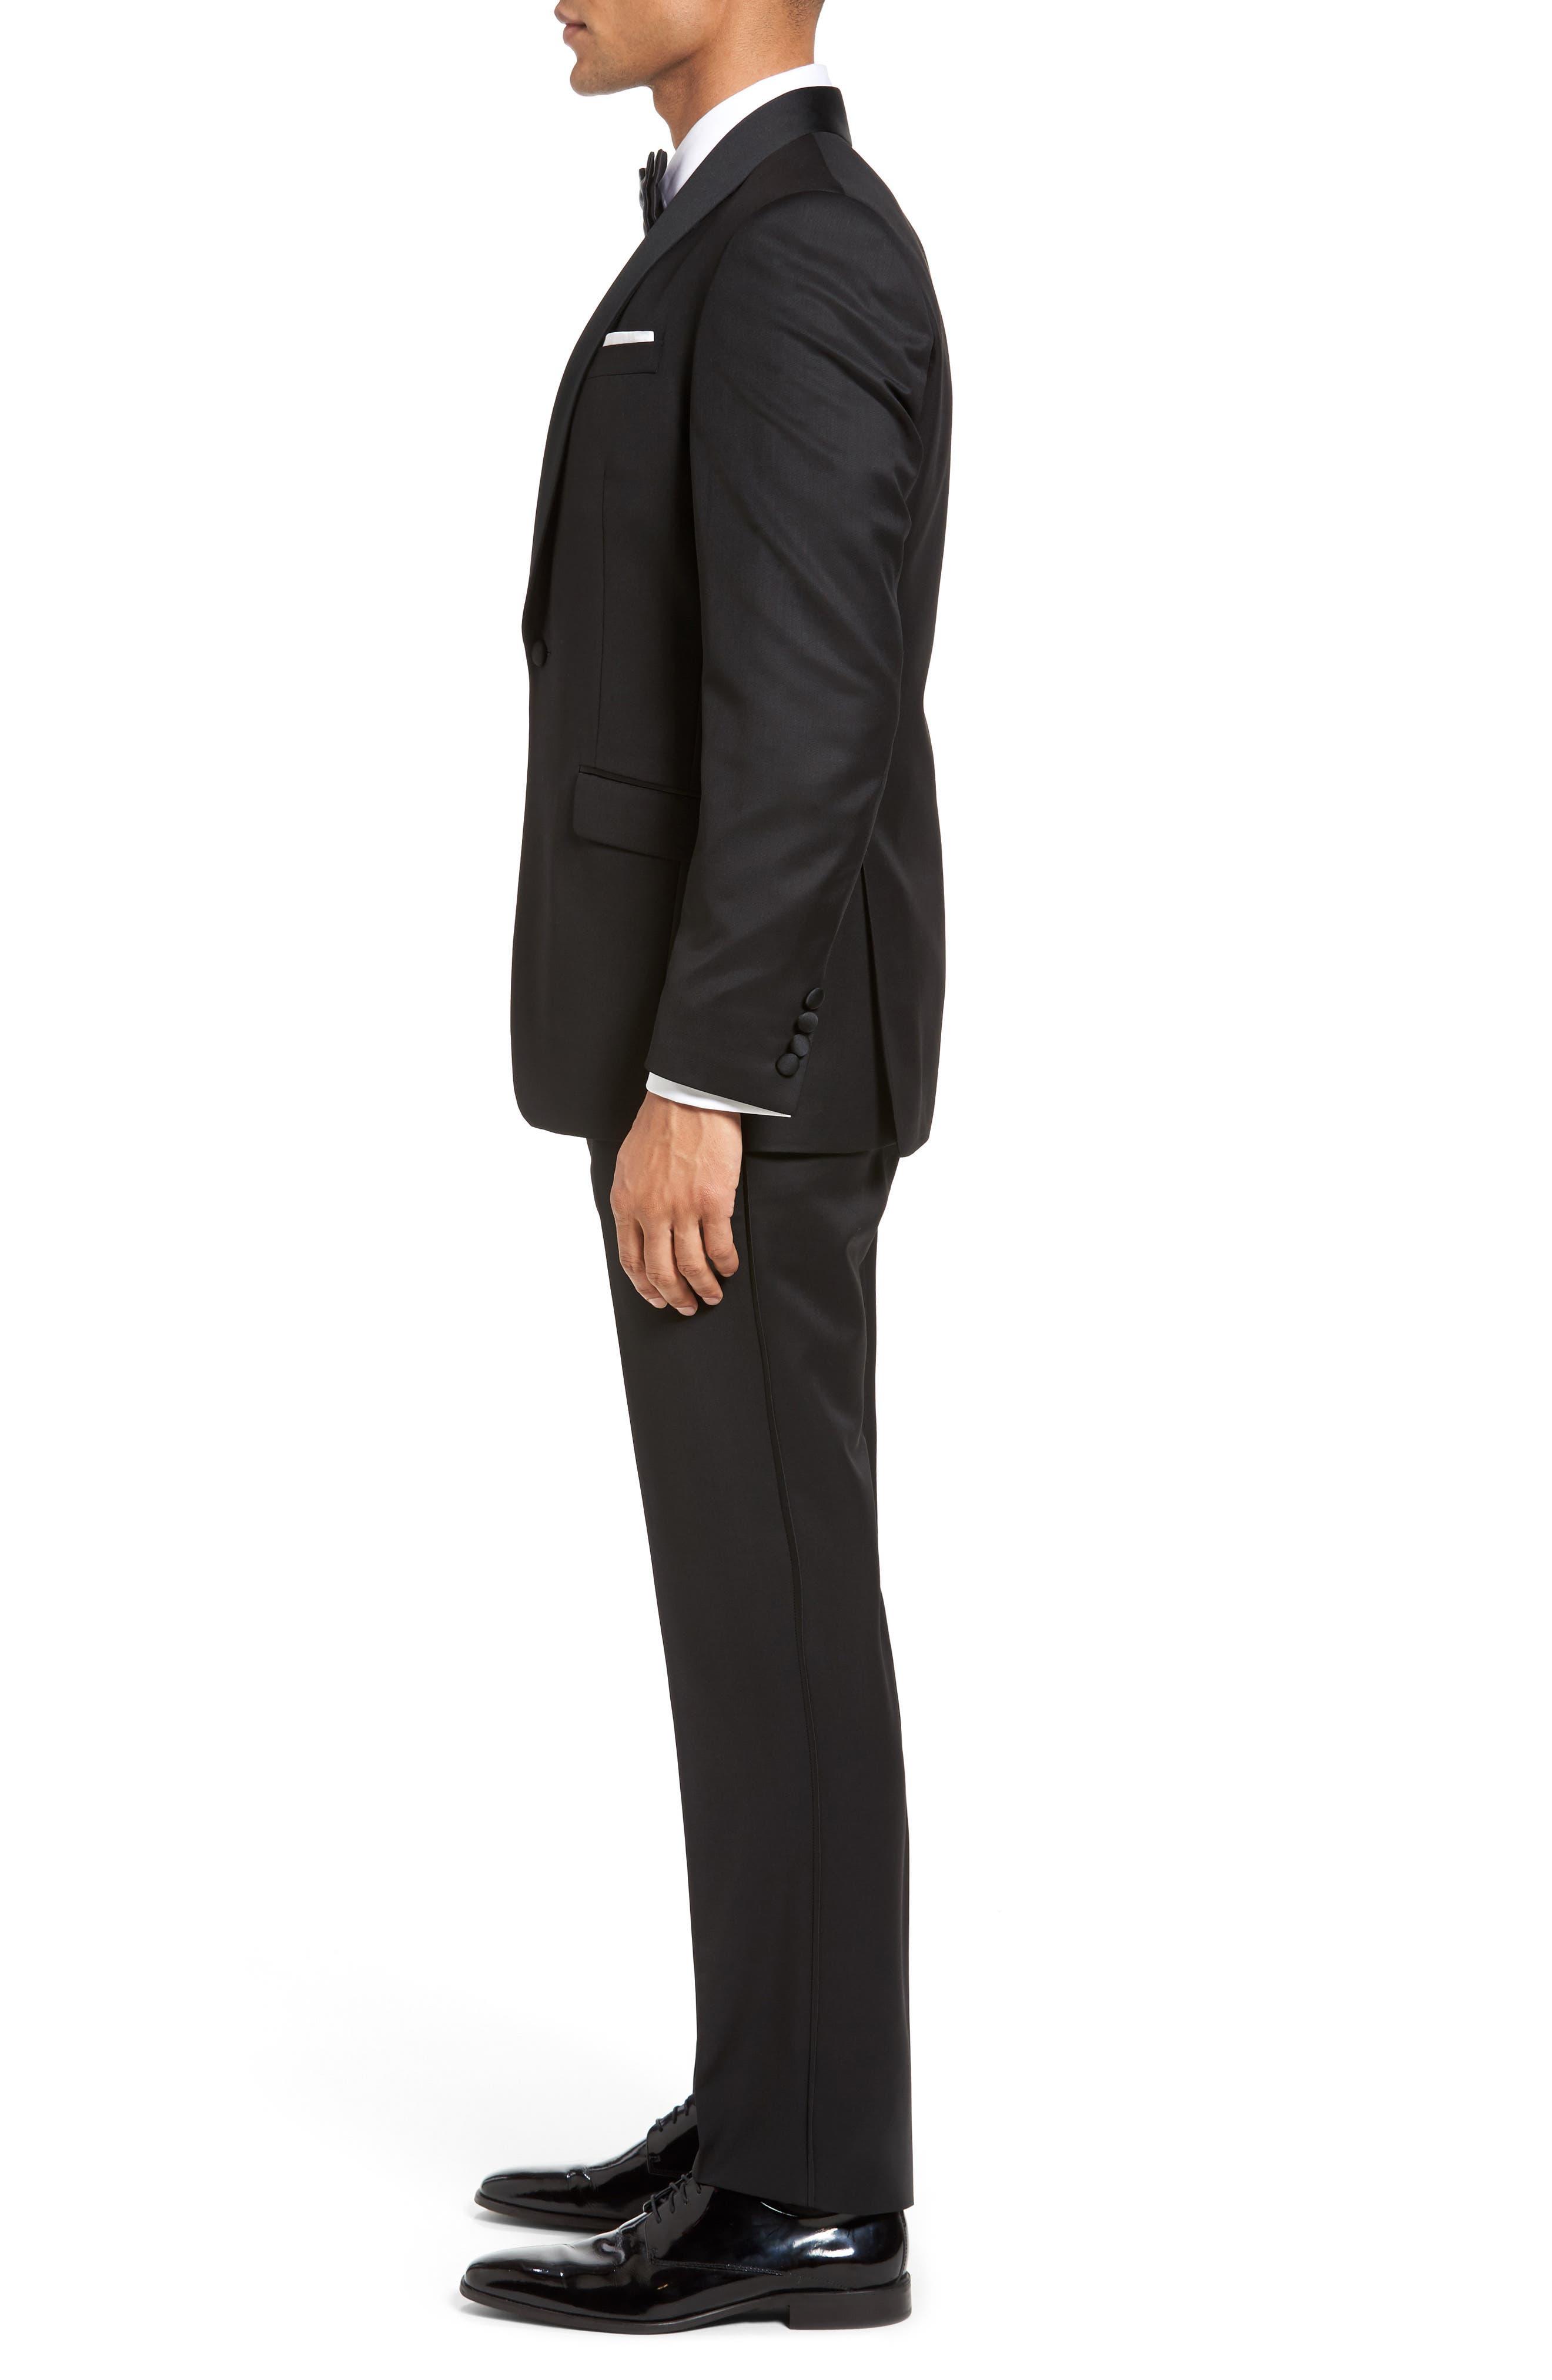 Josh Trim Fit Wool & Mohair Tuxedo,                             Alternate thumbnail 3, color,                             BLACK